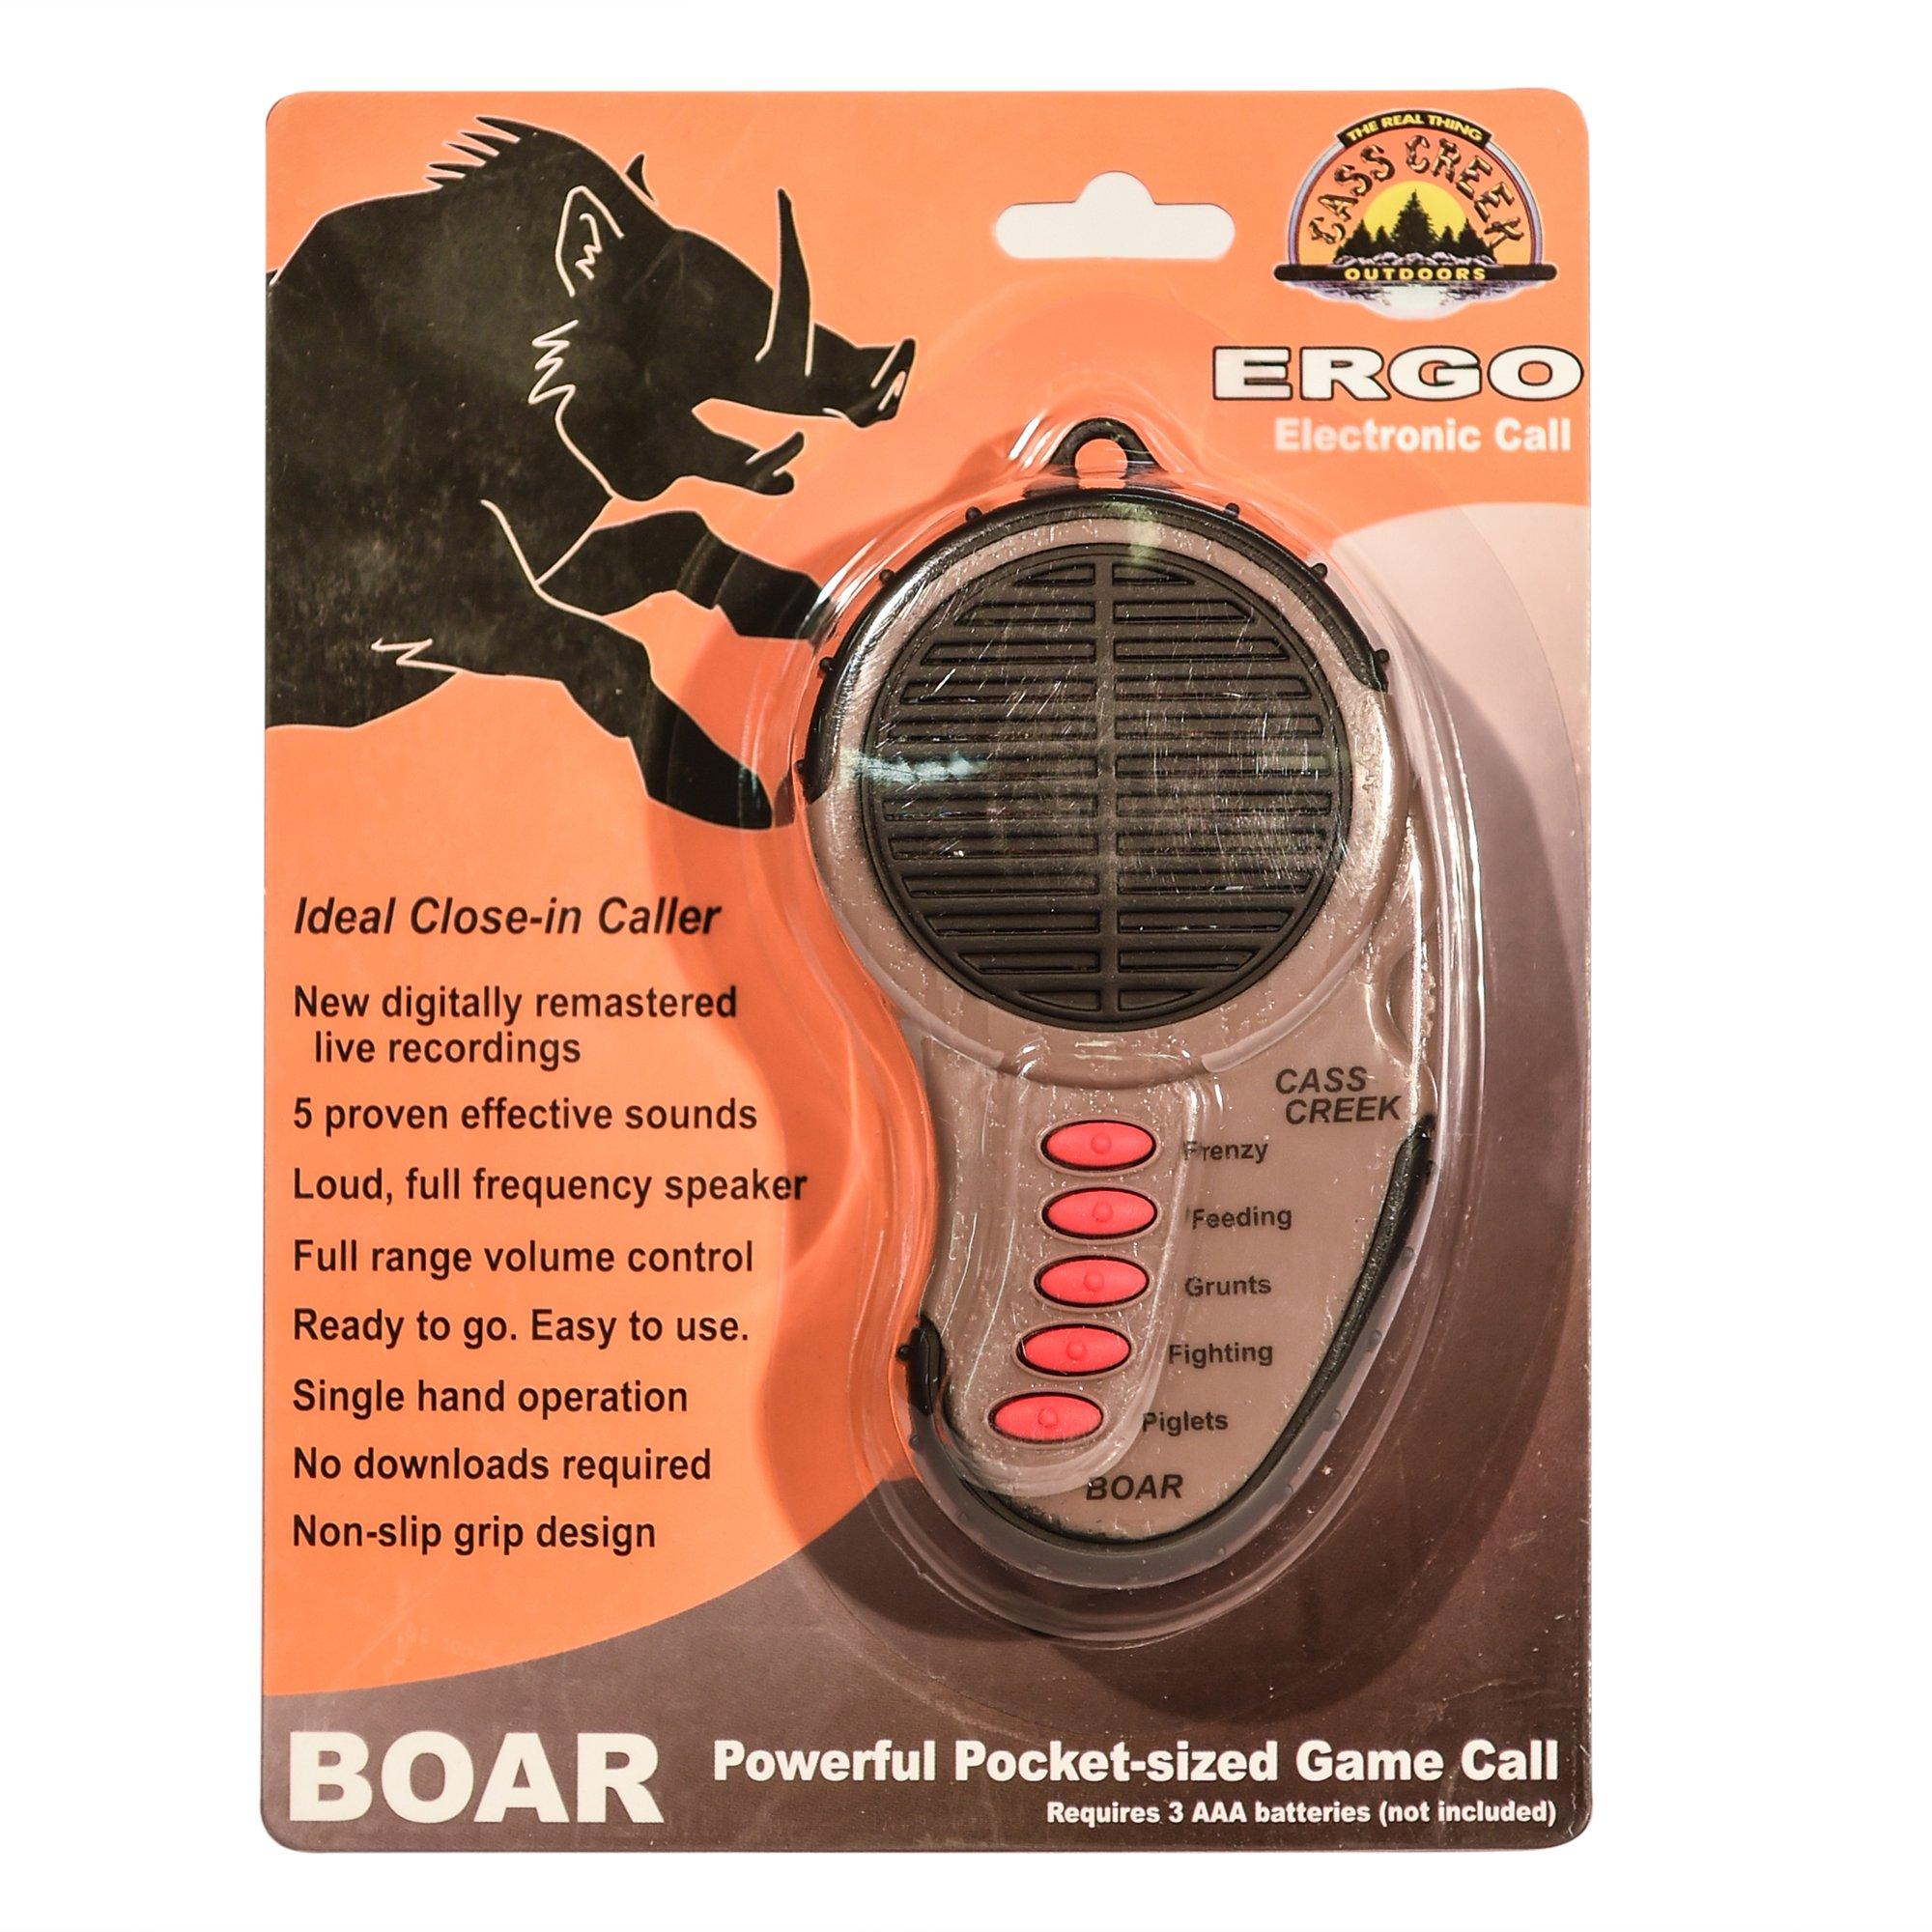 Cass Creek - Ergo Call - Boar Call - CC034 - Handheld Electronic Game Call - Hog Call by Cass Creek (Image #2)